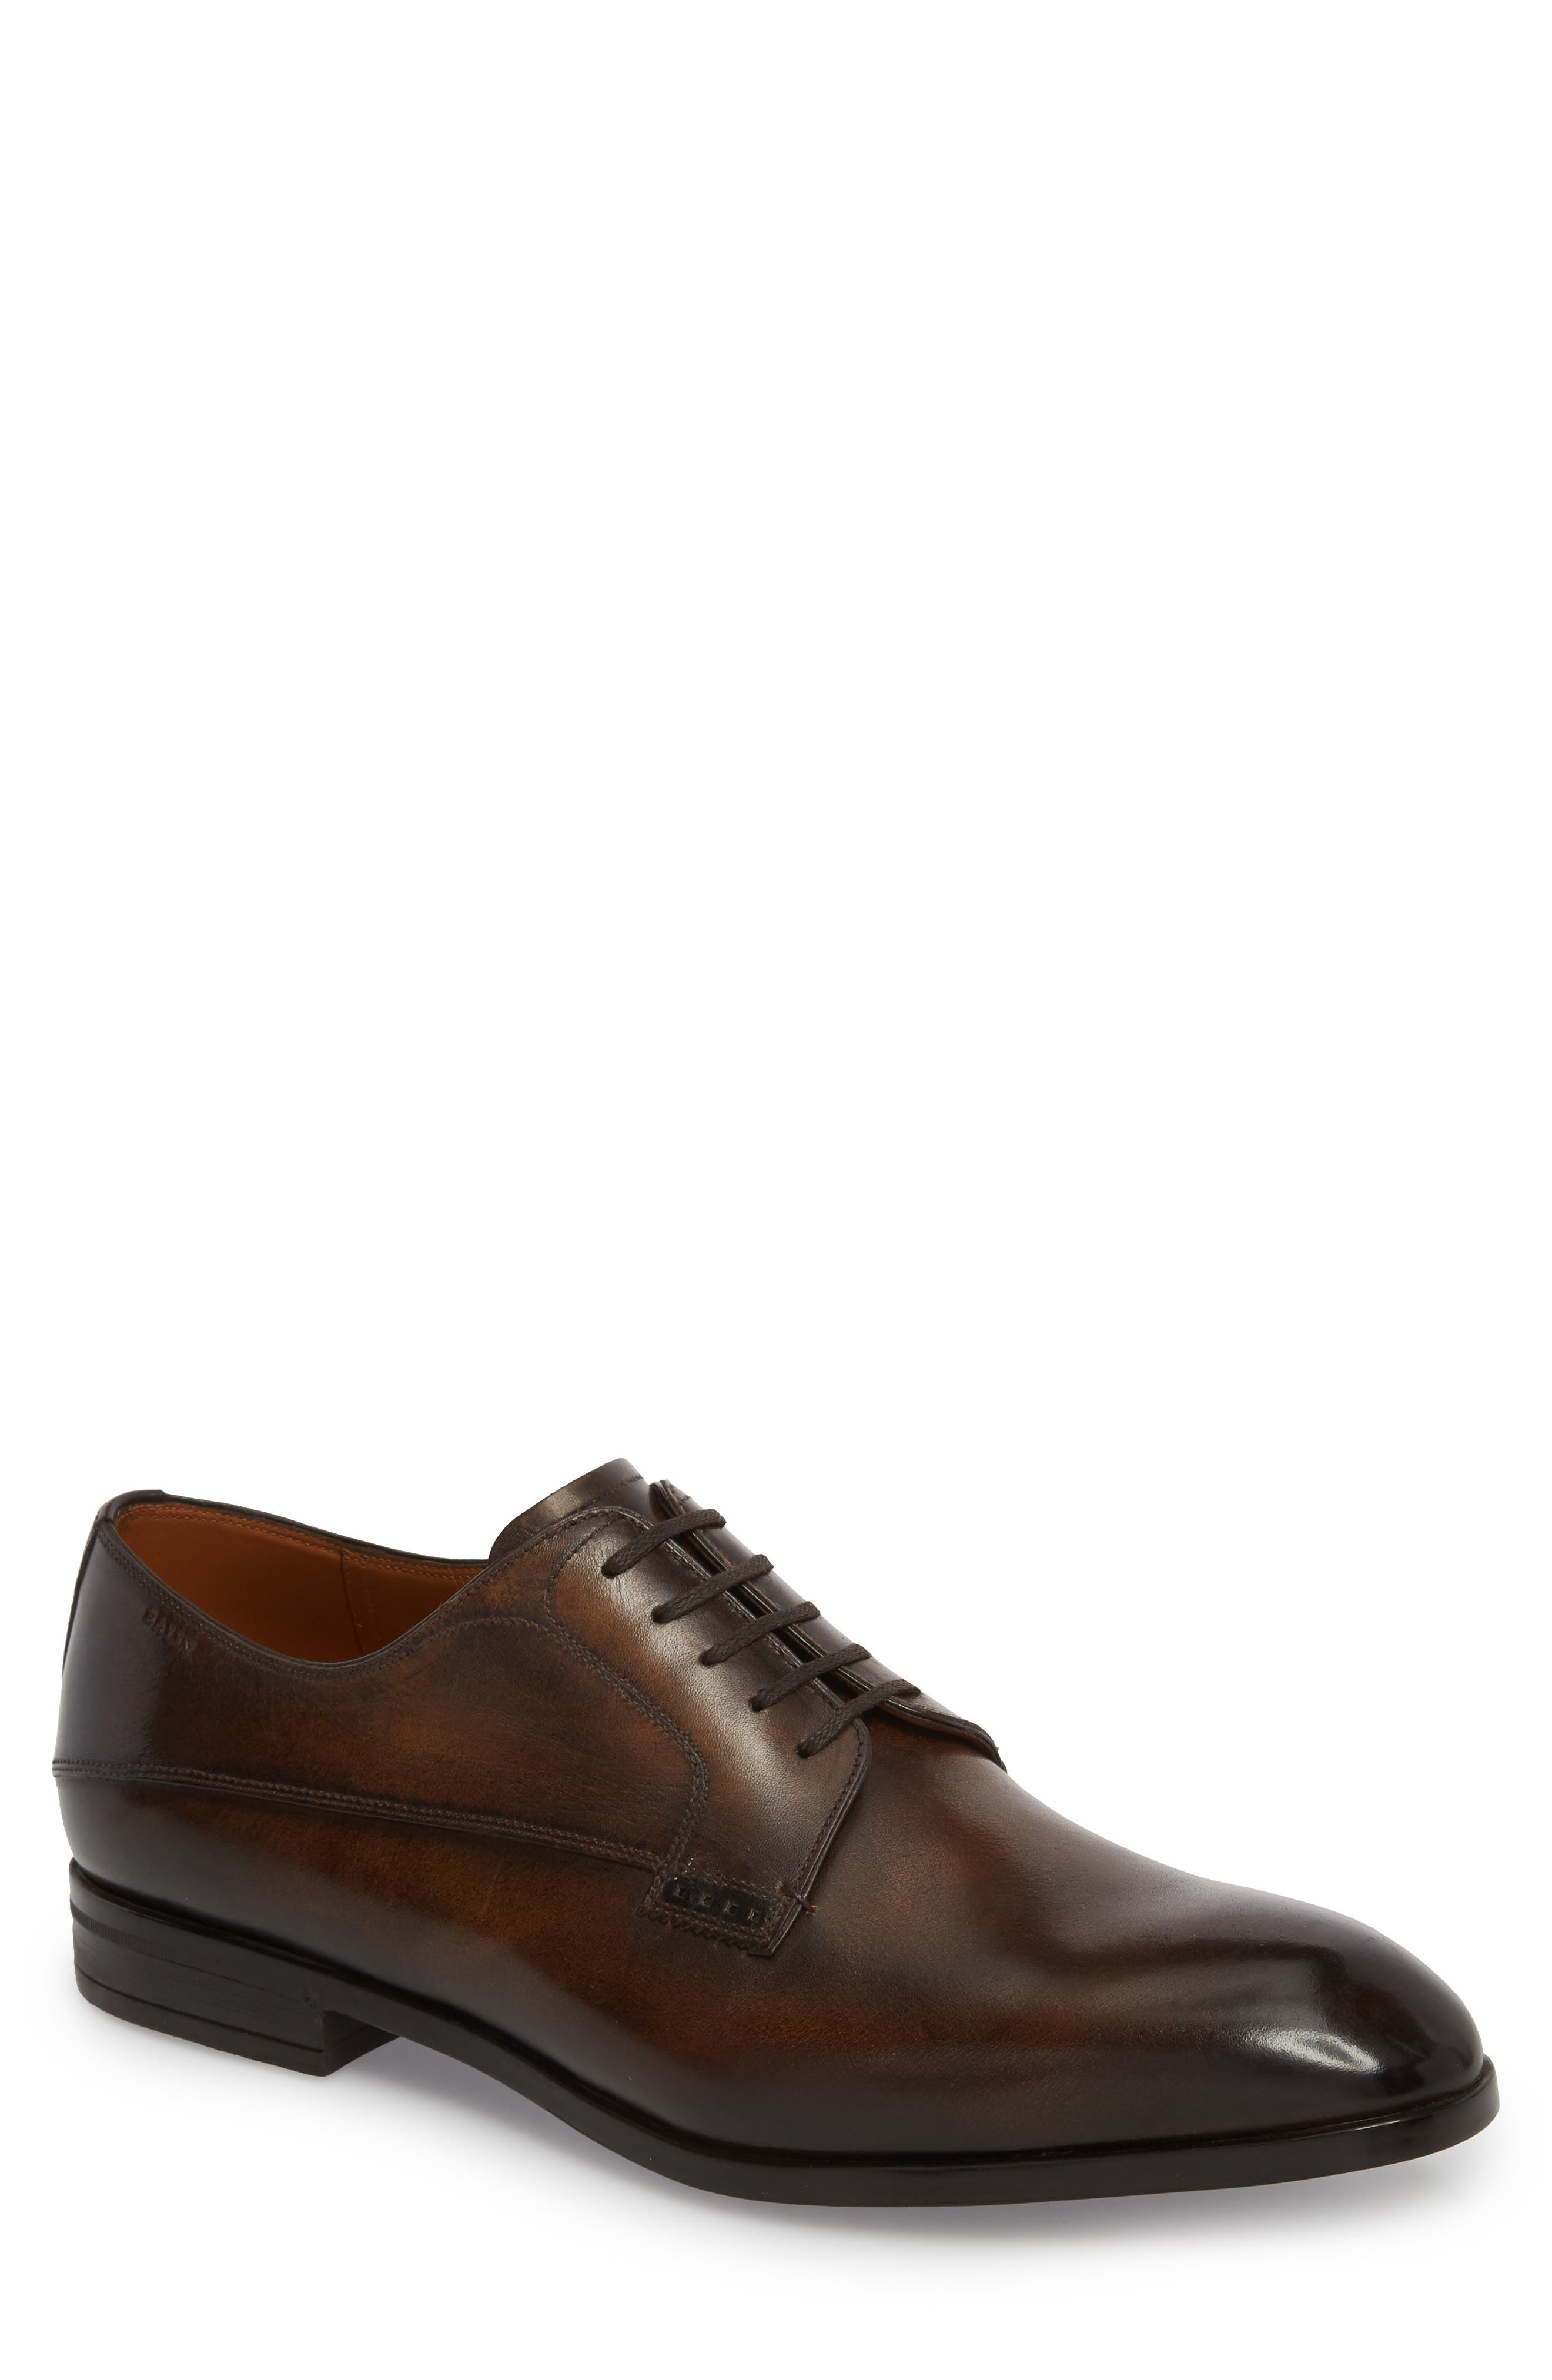 Alternate Image 1 Selected - Bally Lantel Plain Toe Derby (Men)